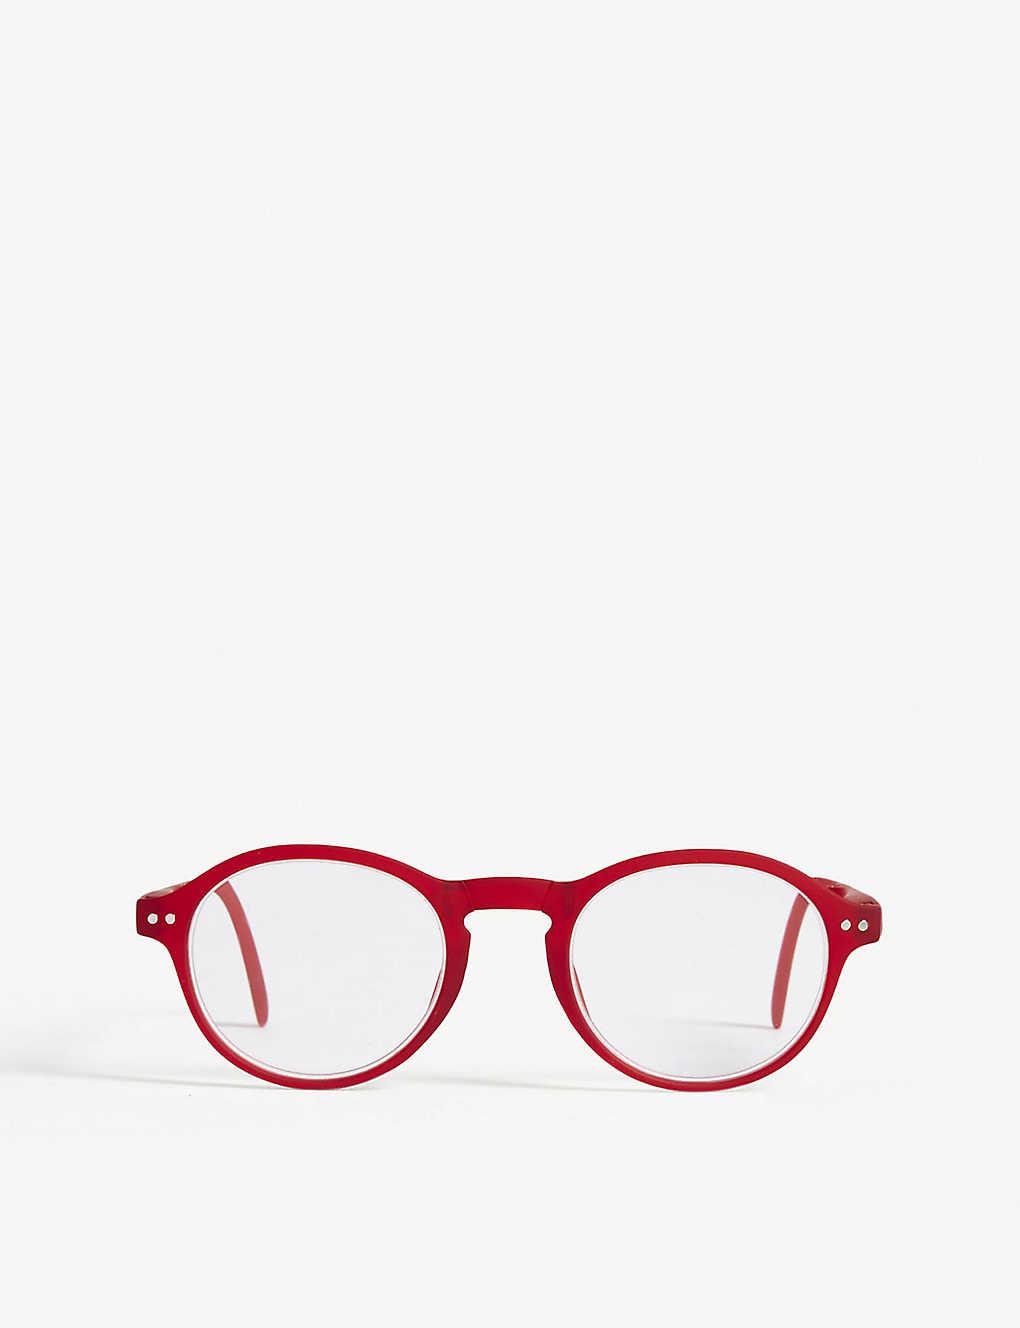 0231a67b59 IZIPIZI - Letmesee  F round-frame foldable reading glasses +1.0 ...